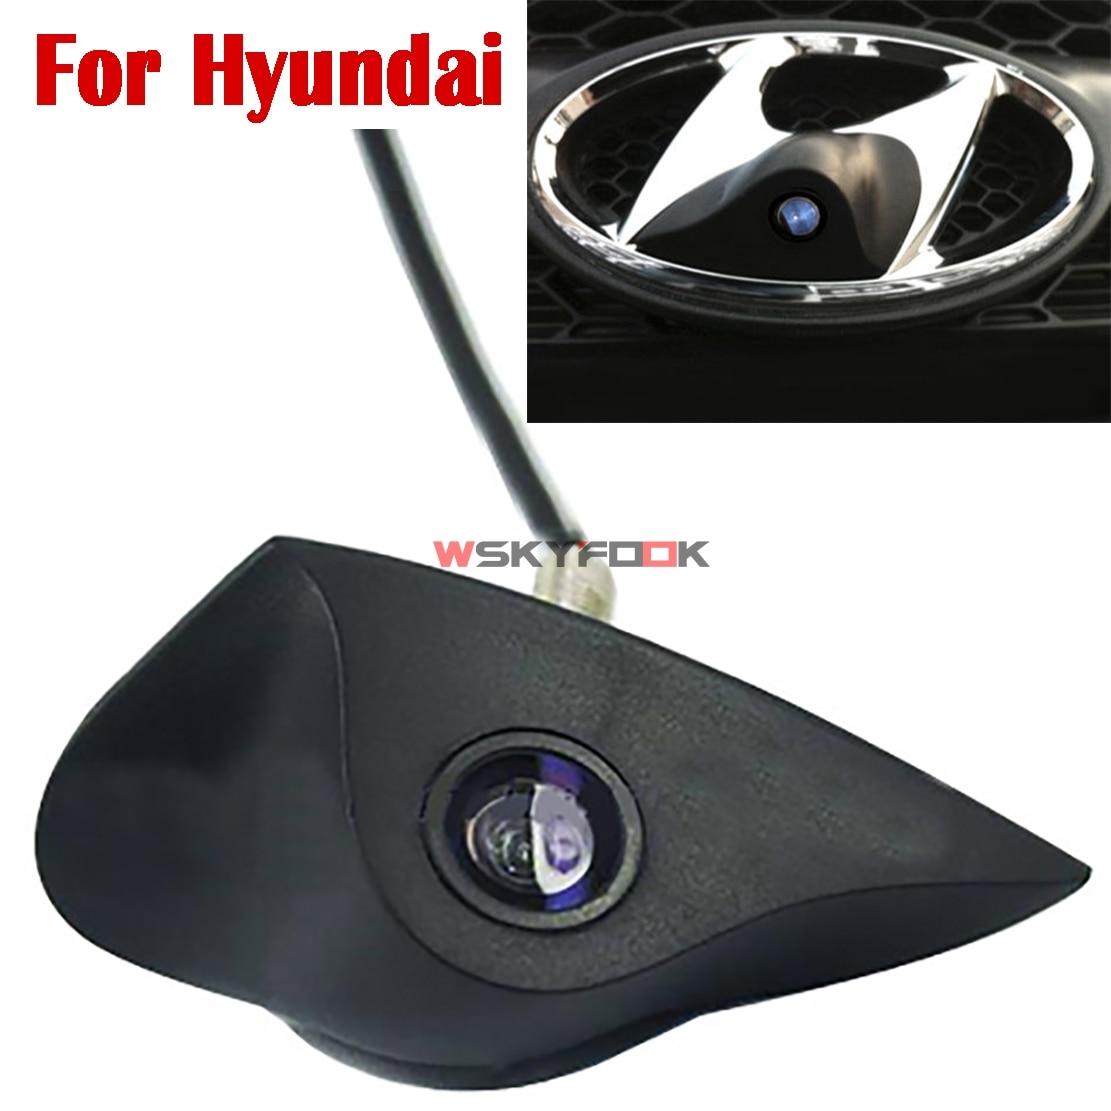 imágenes para 600L CCD night vision Car auto Vehículo vista Frontal Logo Cámara para Mazda emblema Nissan Hyundai Marca frotn logo positivo cámara